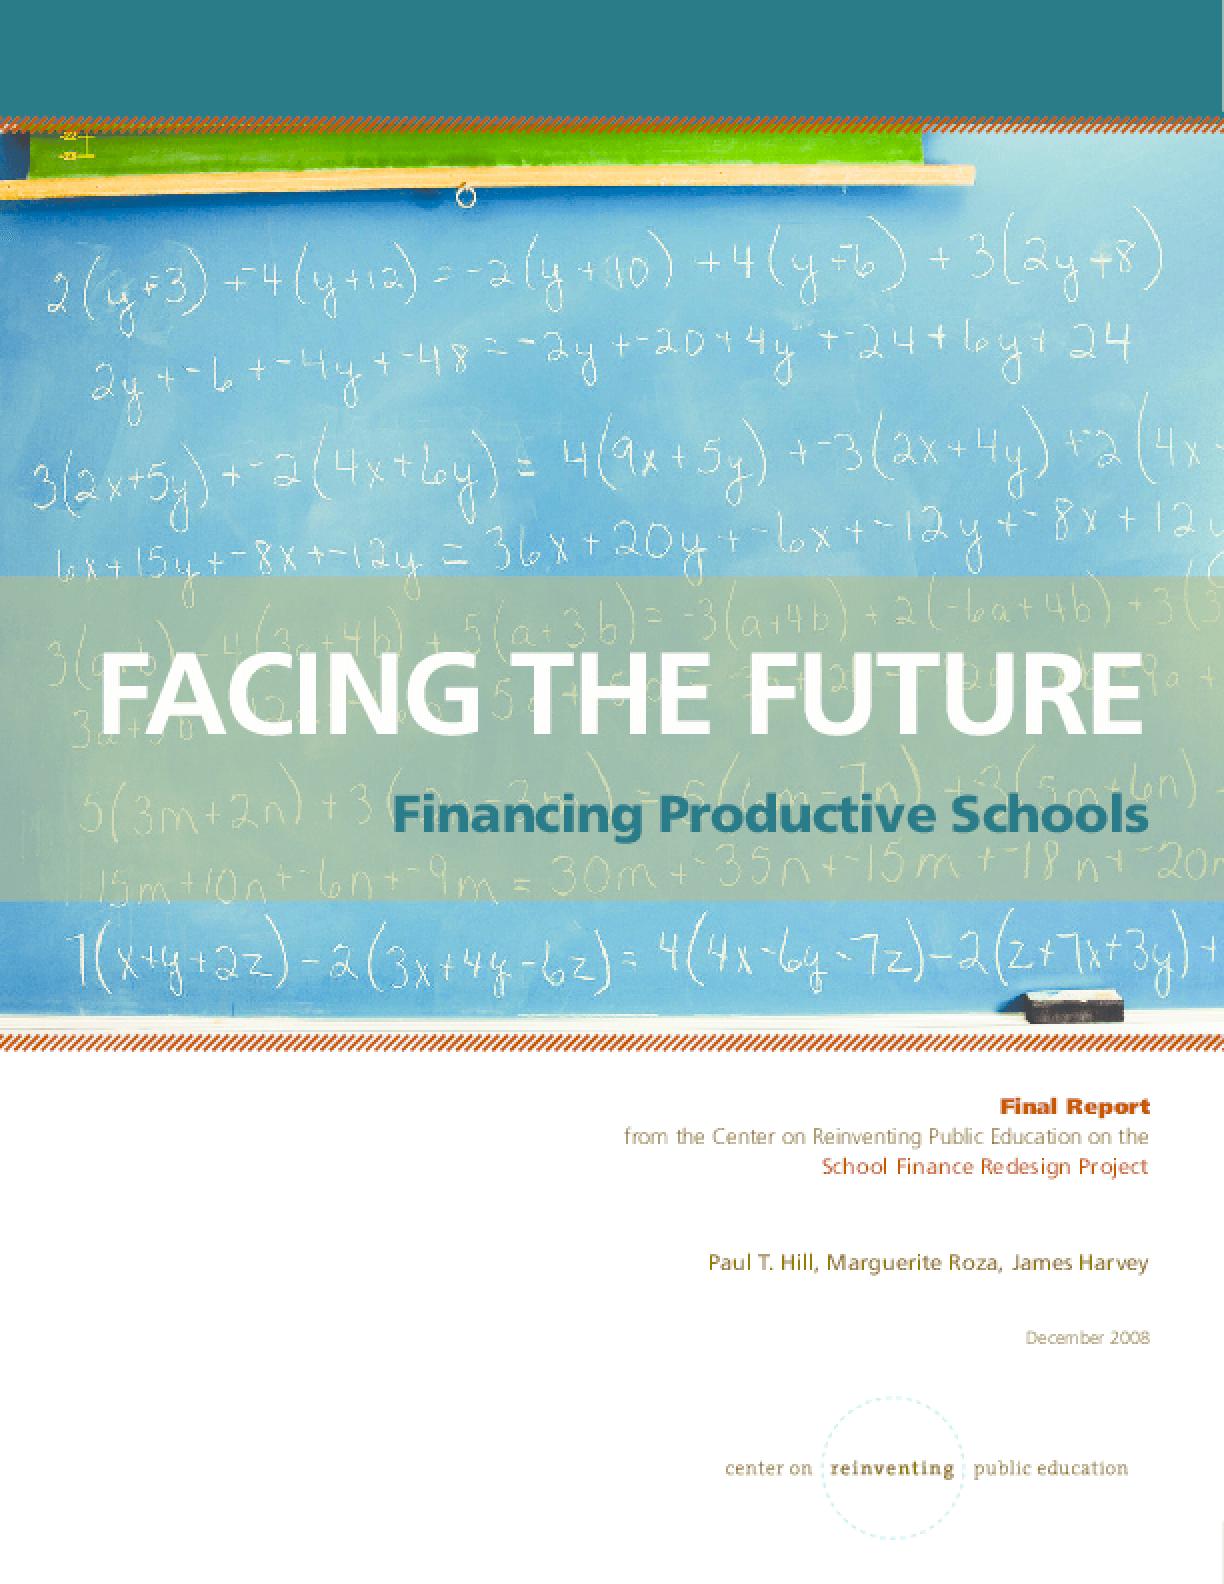 Facing the Future: Financing Productive Schools